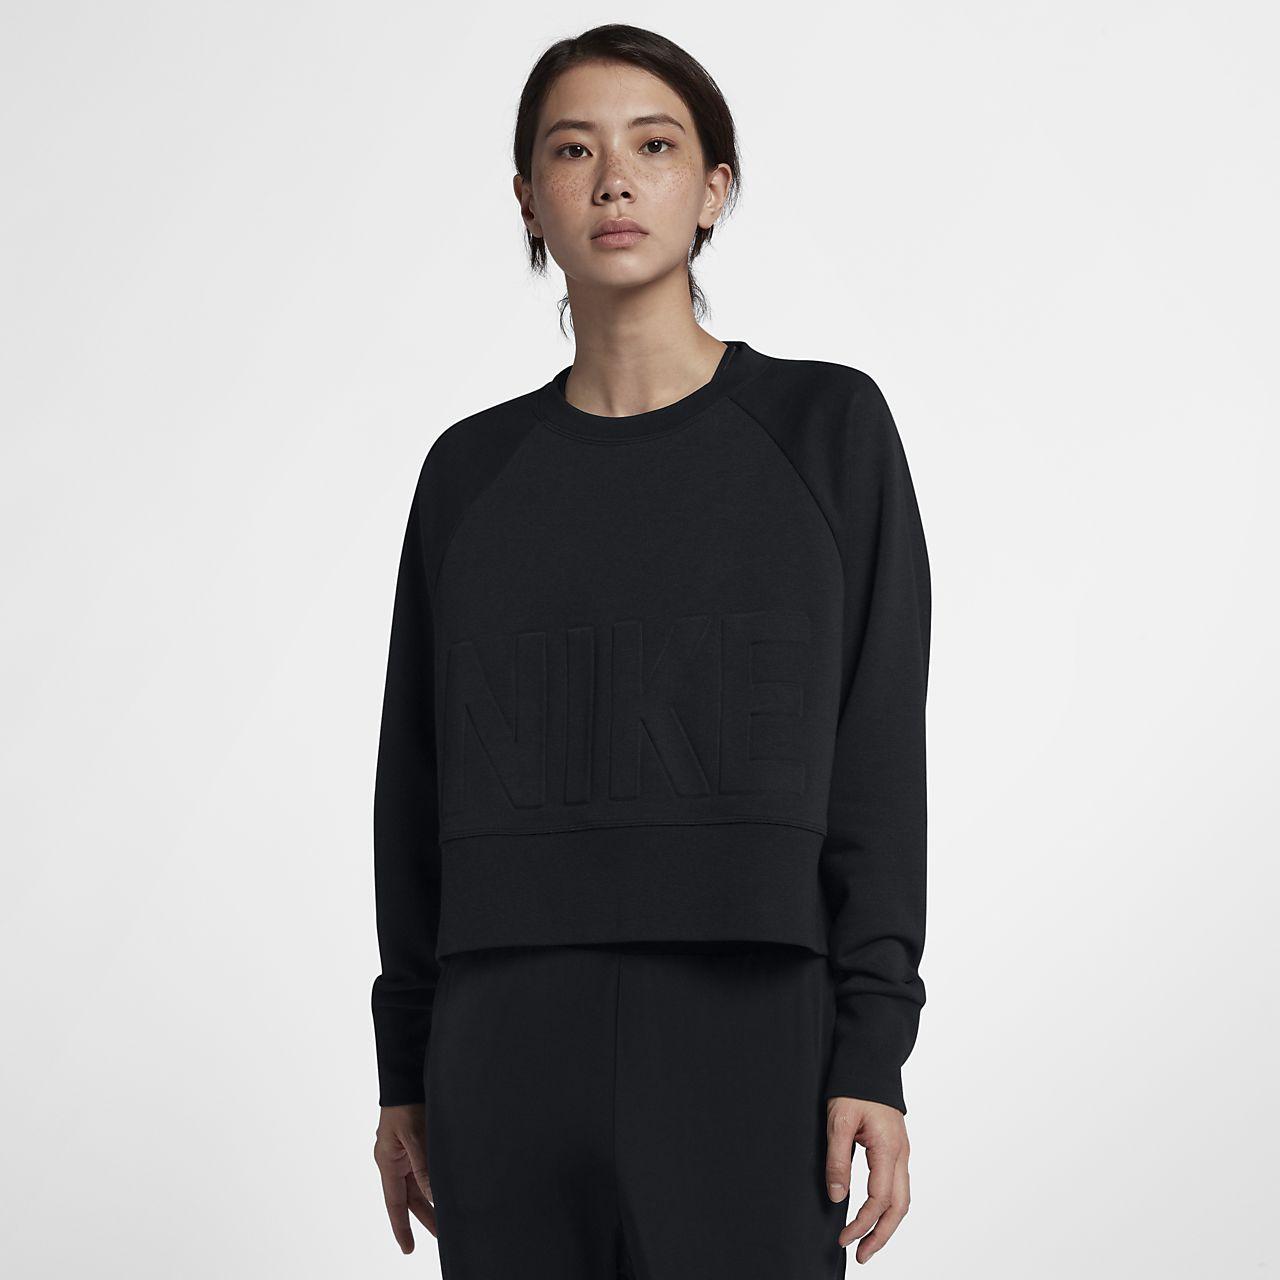 Damska koszulka treningowa z długim rękawem Nike Versa